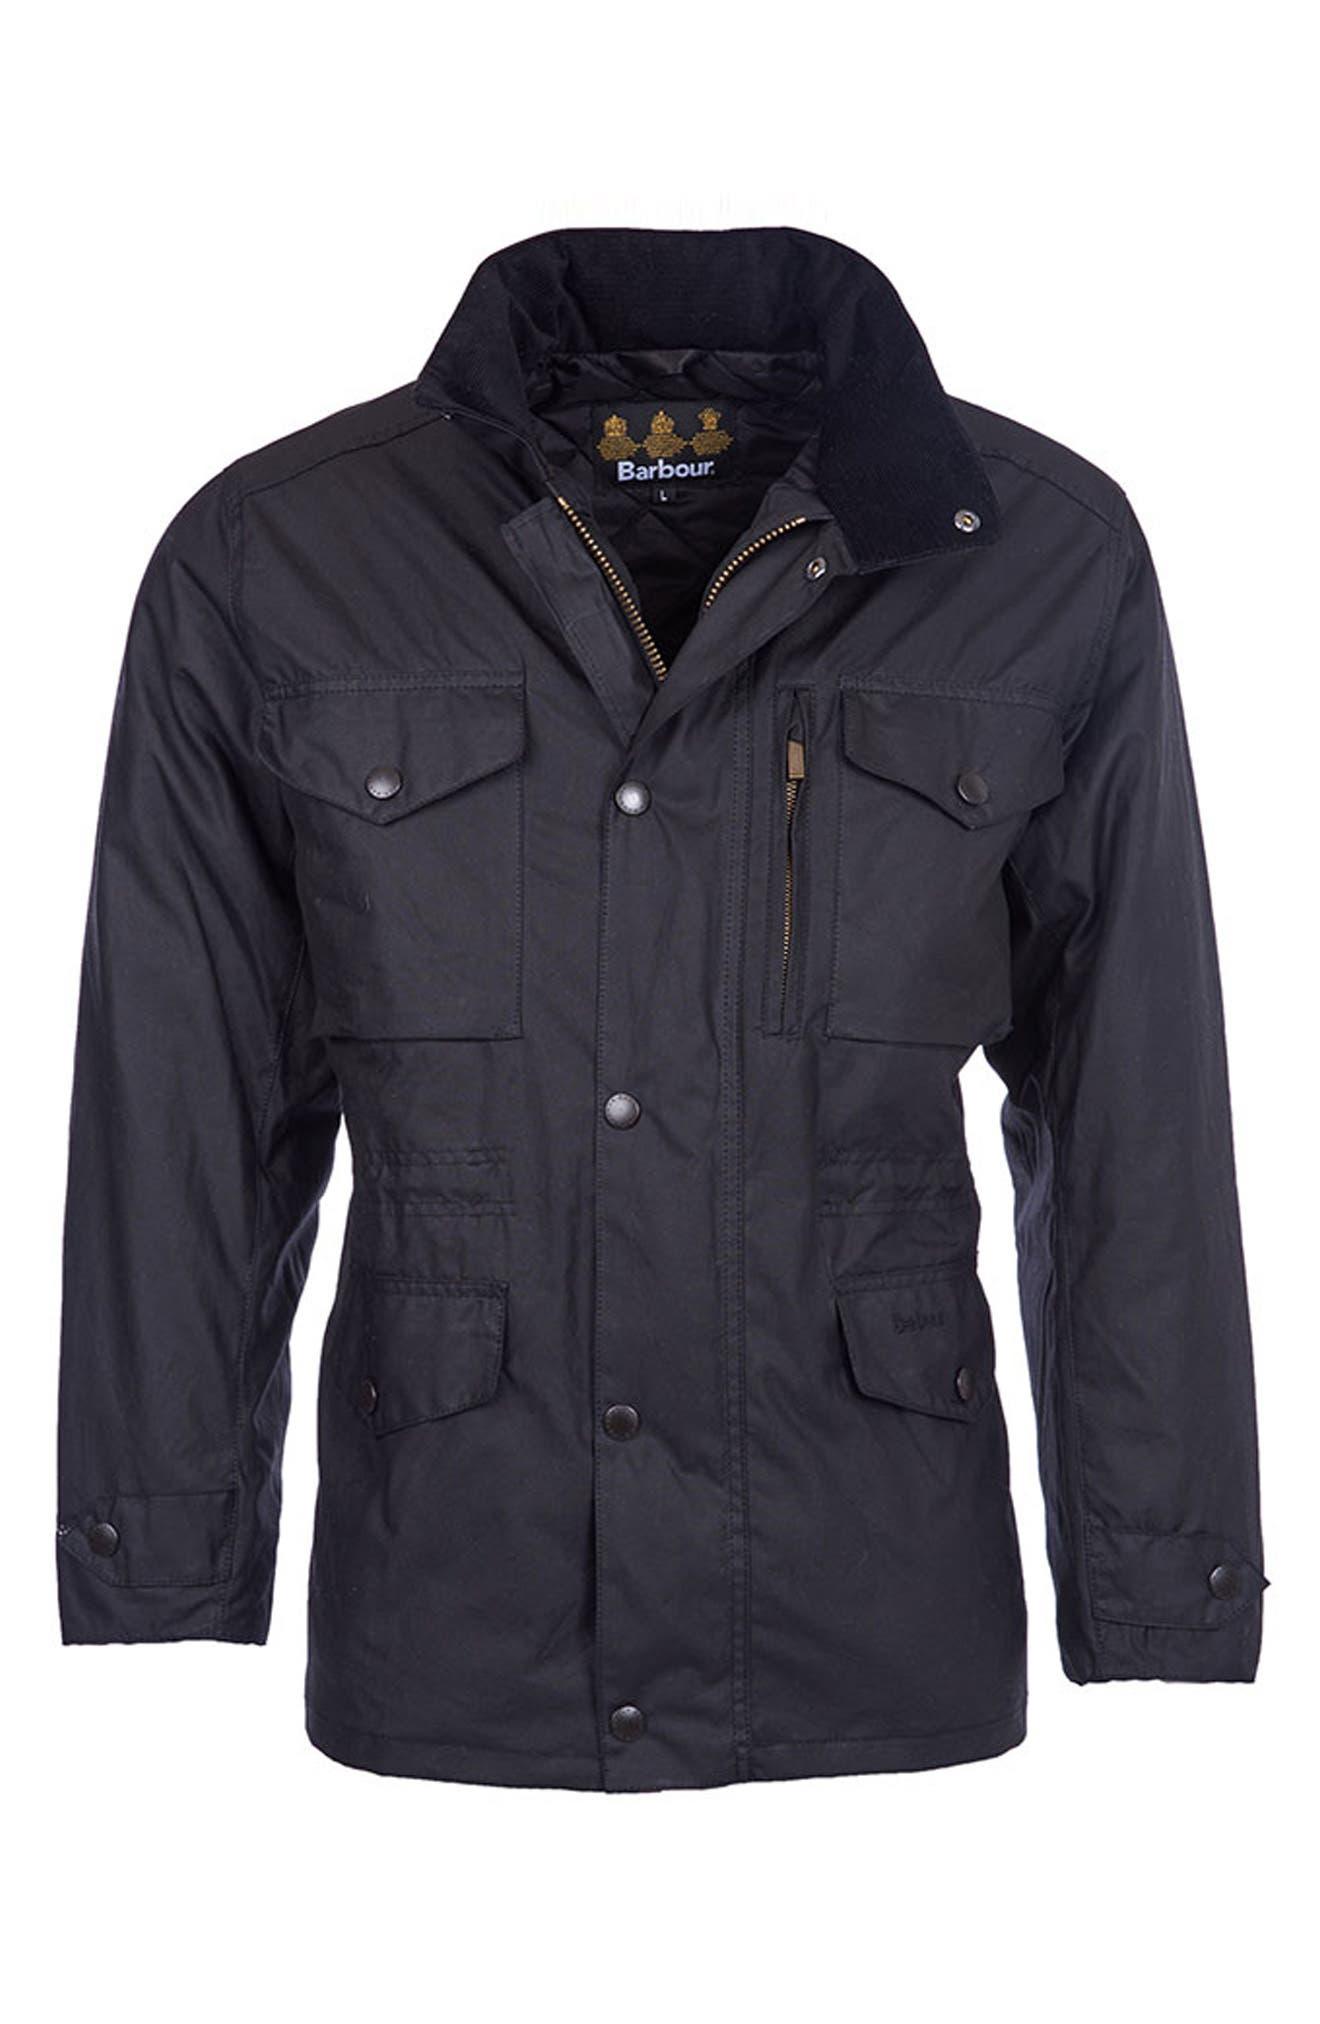 'Sapper' Regular Fit Waterproof Waxed Cotton Jacket,                             Main thumbnail 1, color,                             BLACK